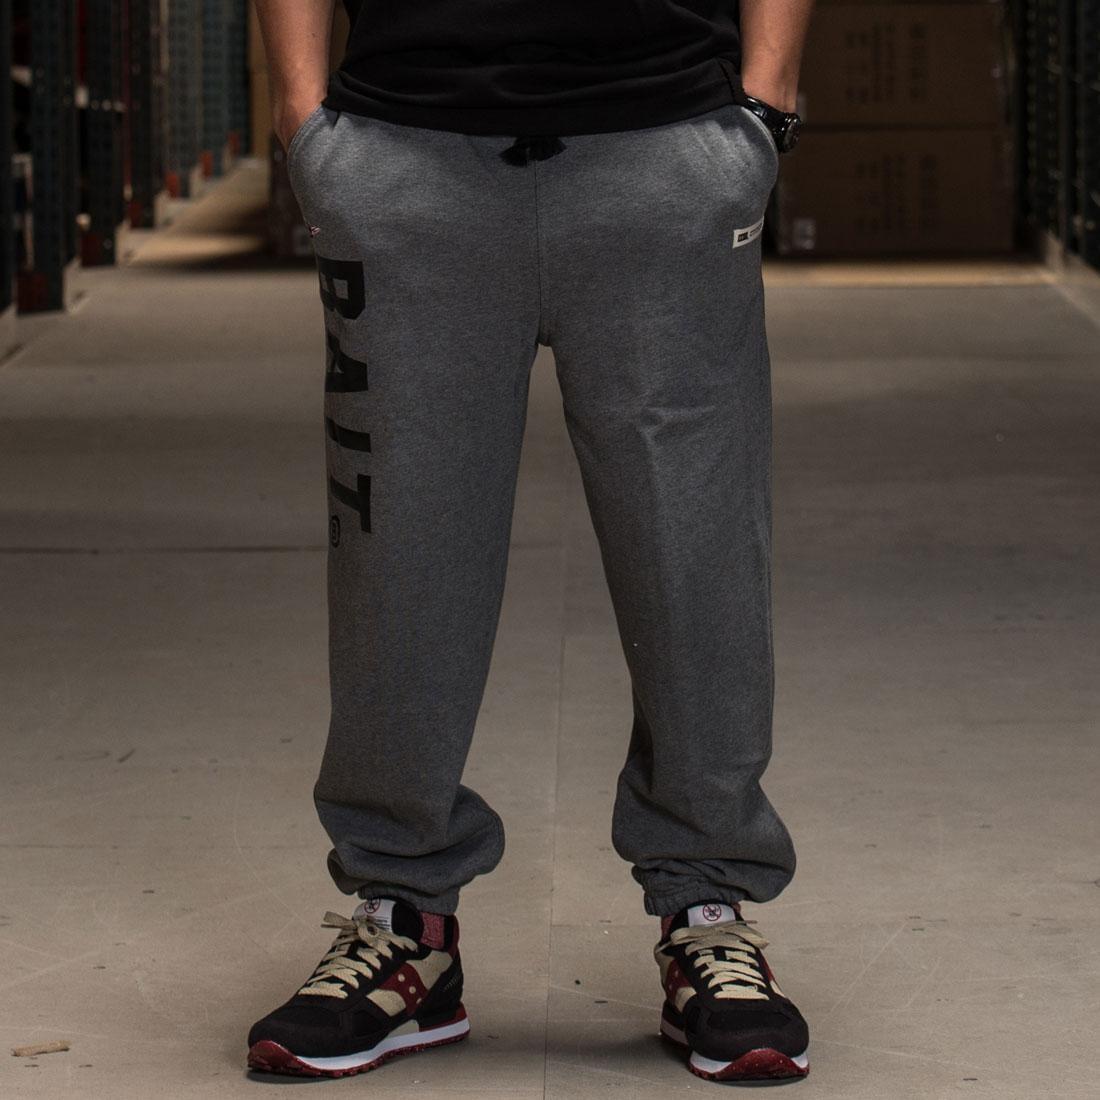 BAIT Basics Sweatpants (gray / heather grey)